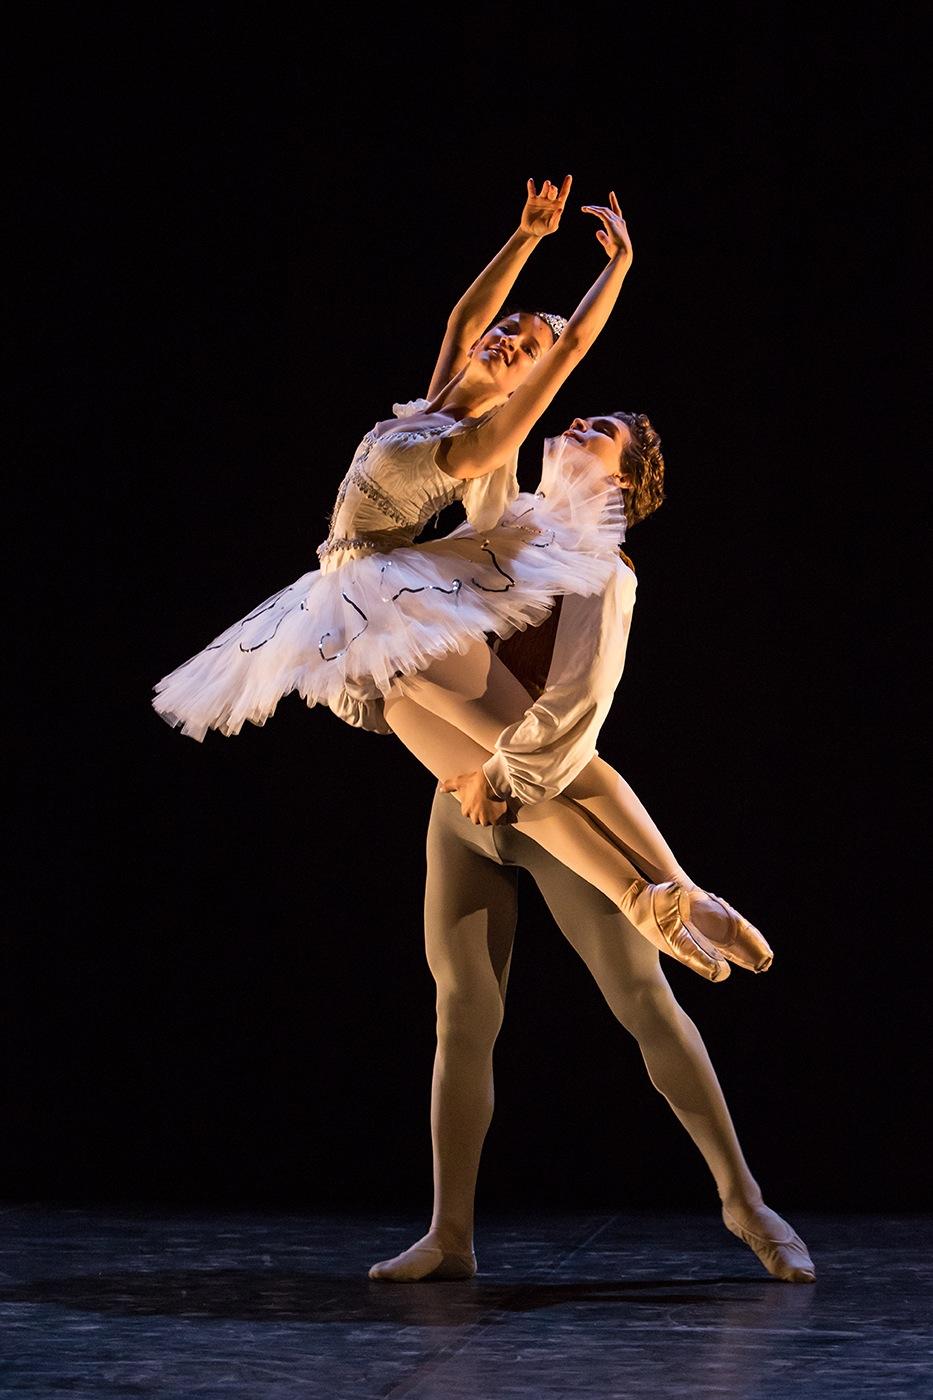 photographe-reportage-danse-avec-ton-crous-guillaume-heraud-003-small